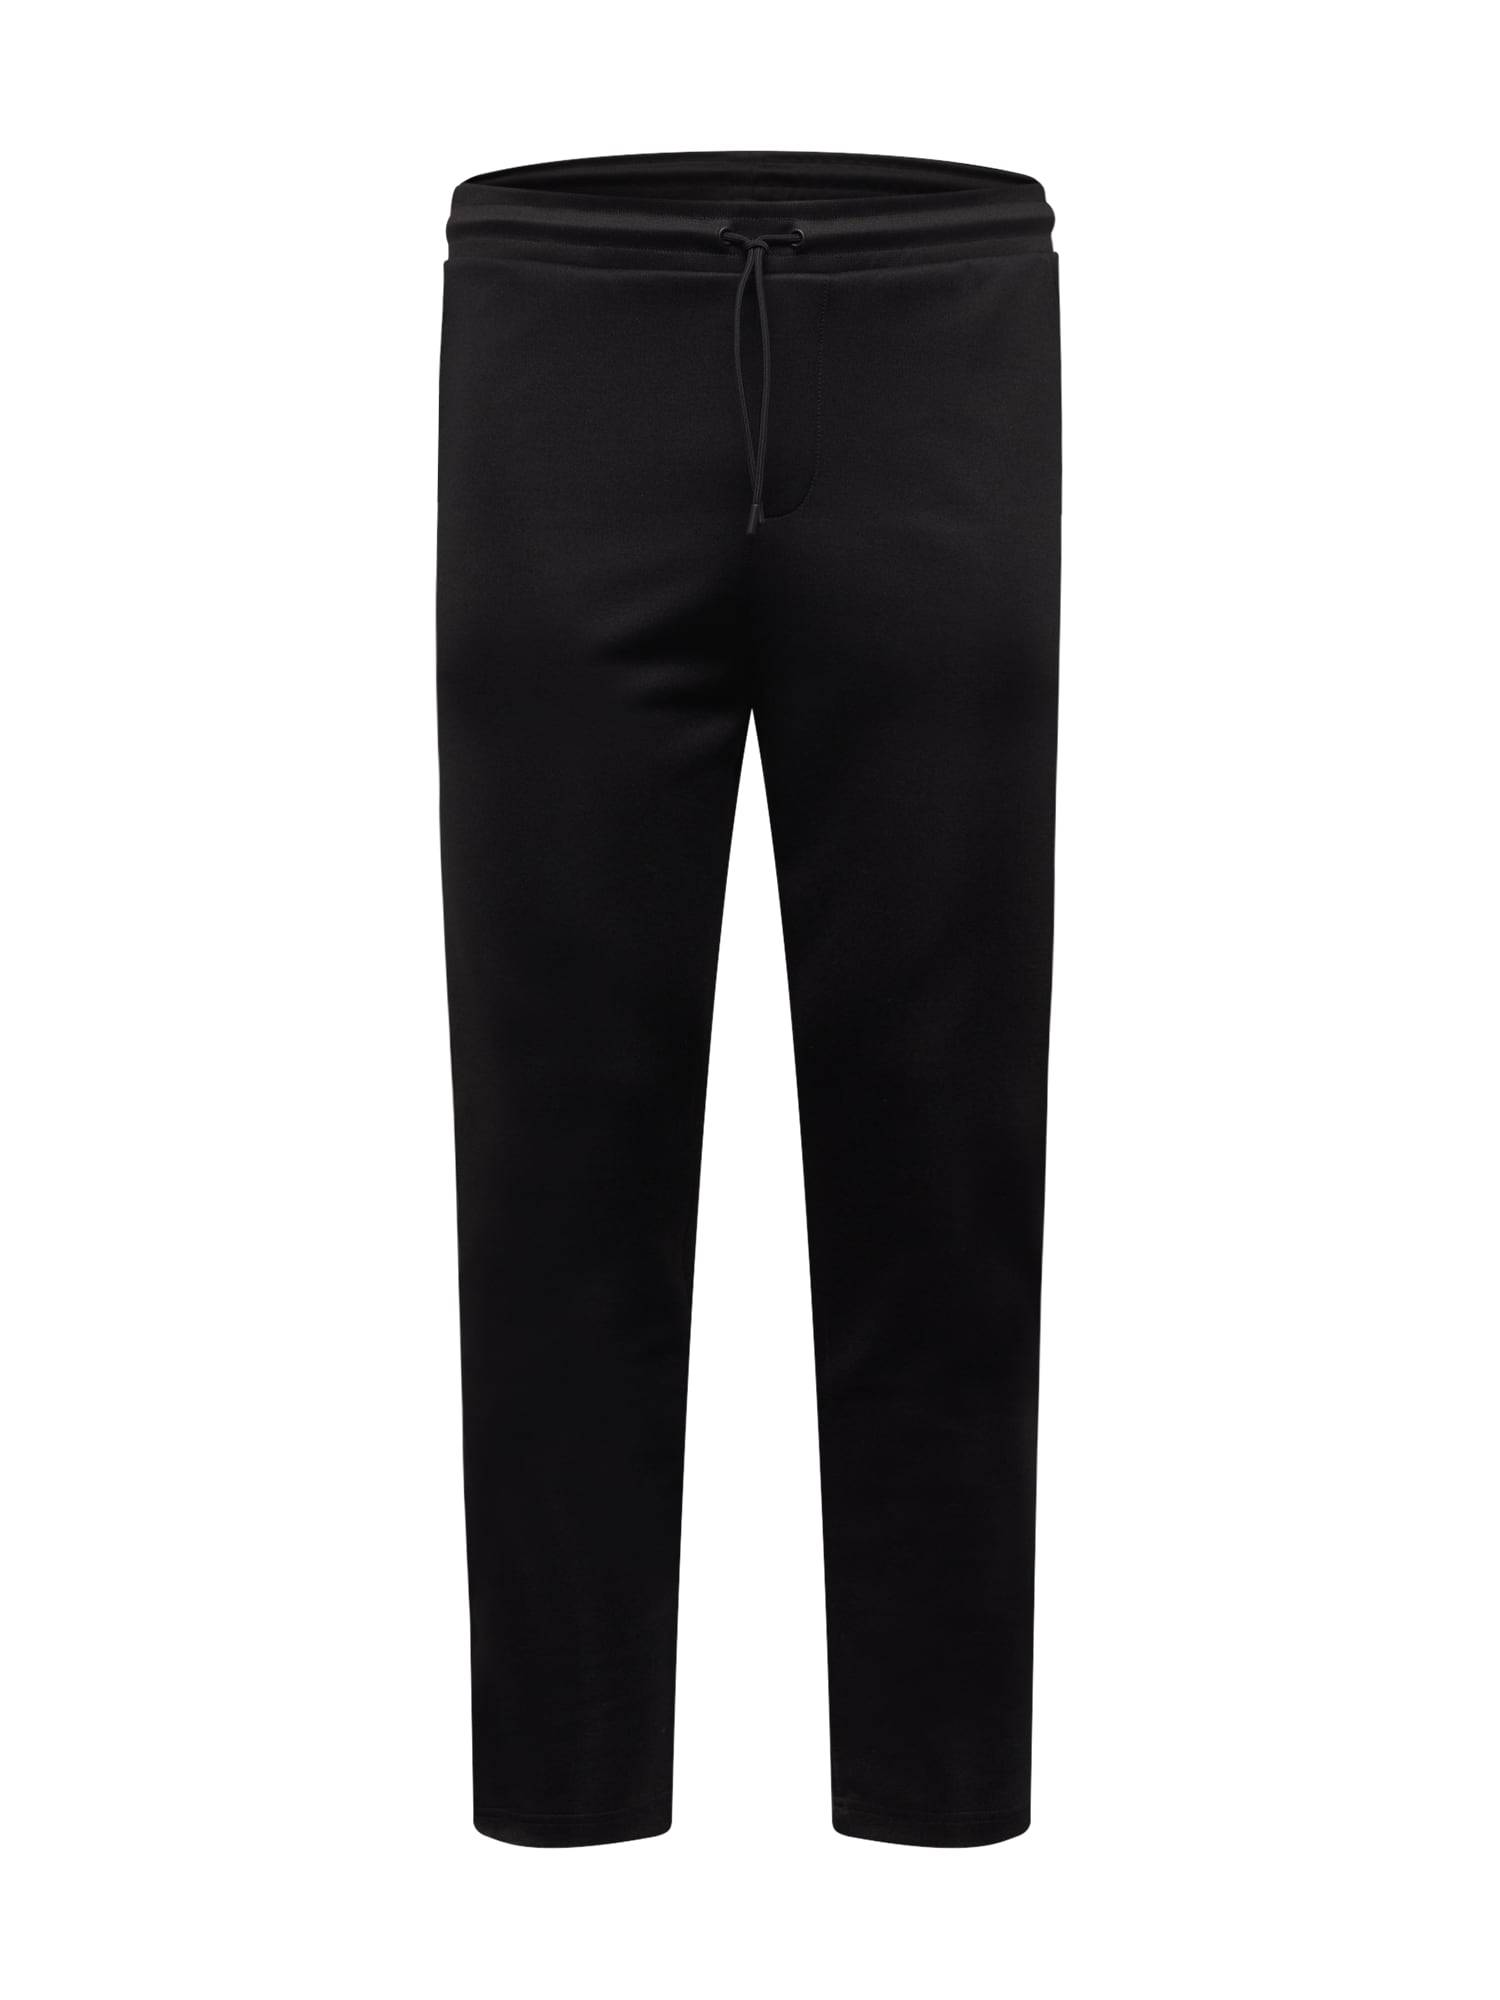 The Kooples Pantalon  - Noir - Taille: XL - male